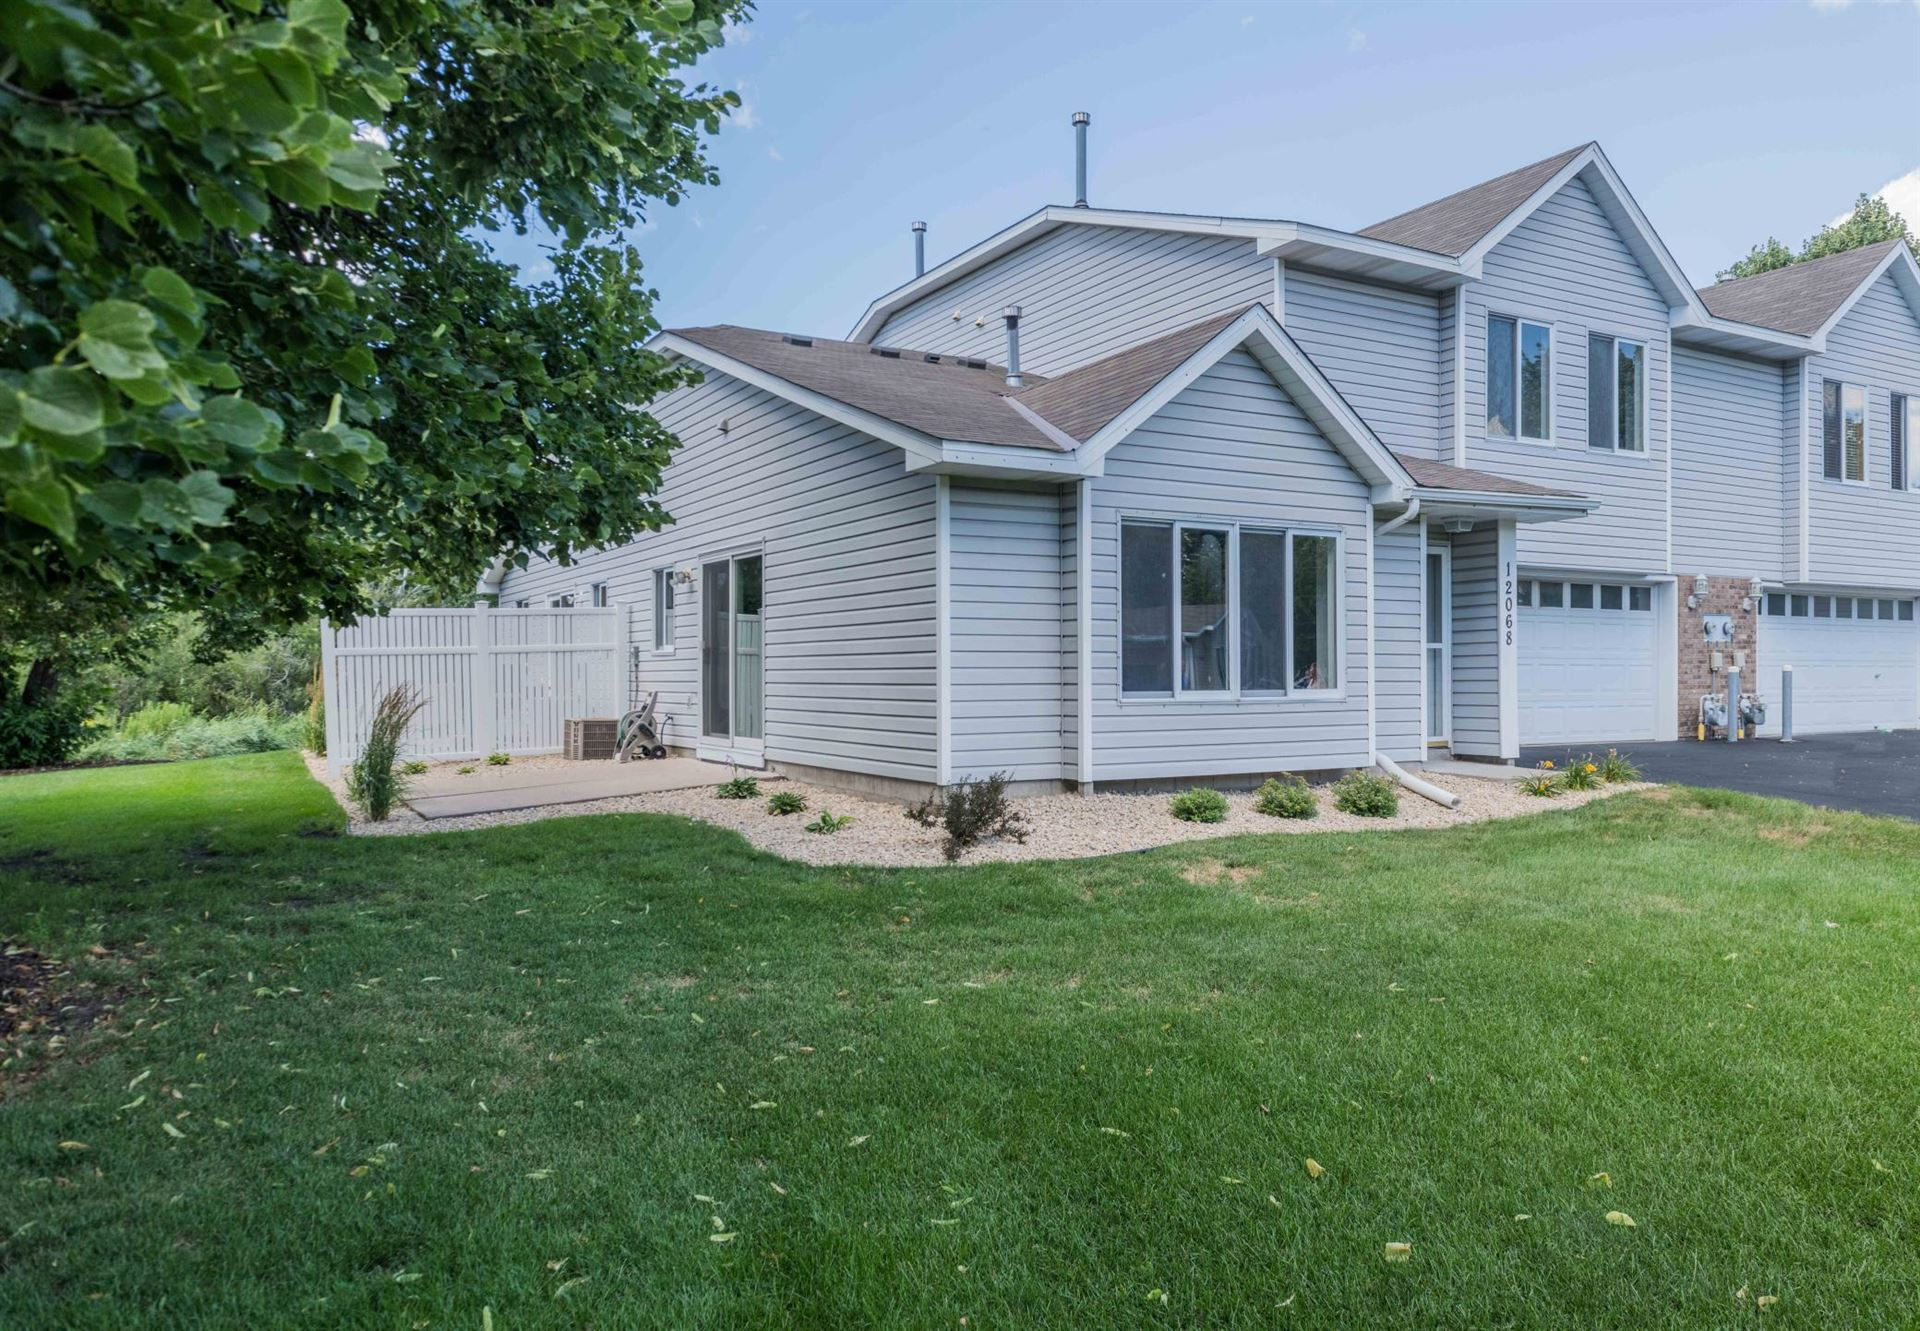 12068 Yellow Pine Street NW, Coon Rapids, MN 55448 - MLS#: 5631763